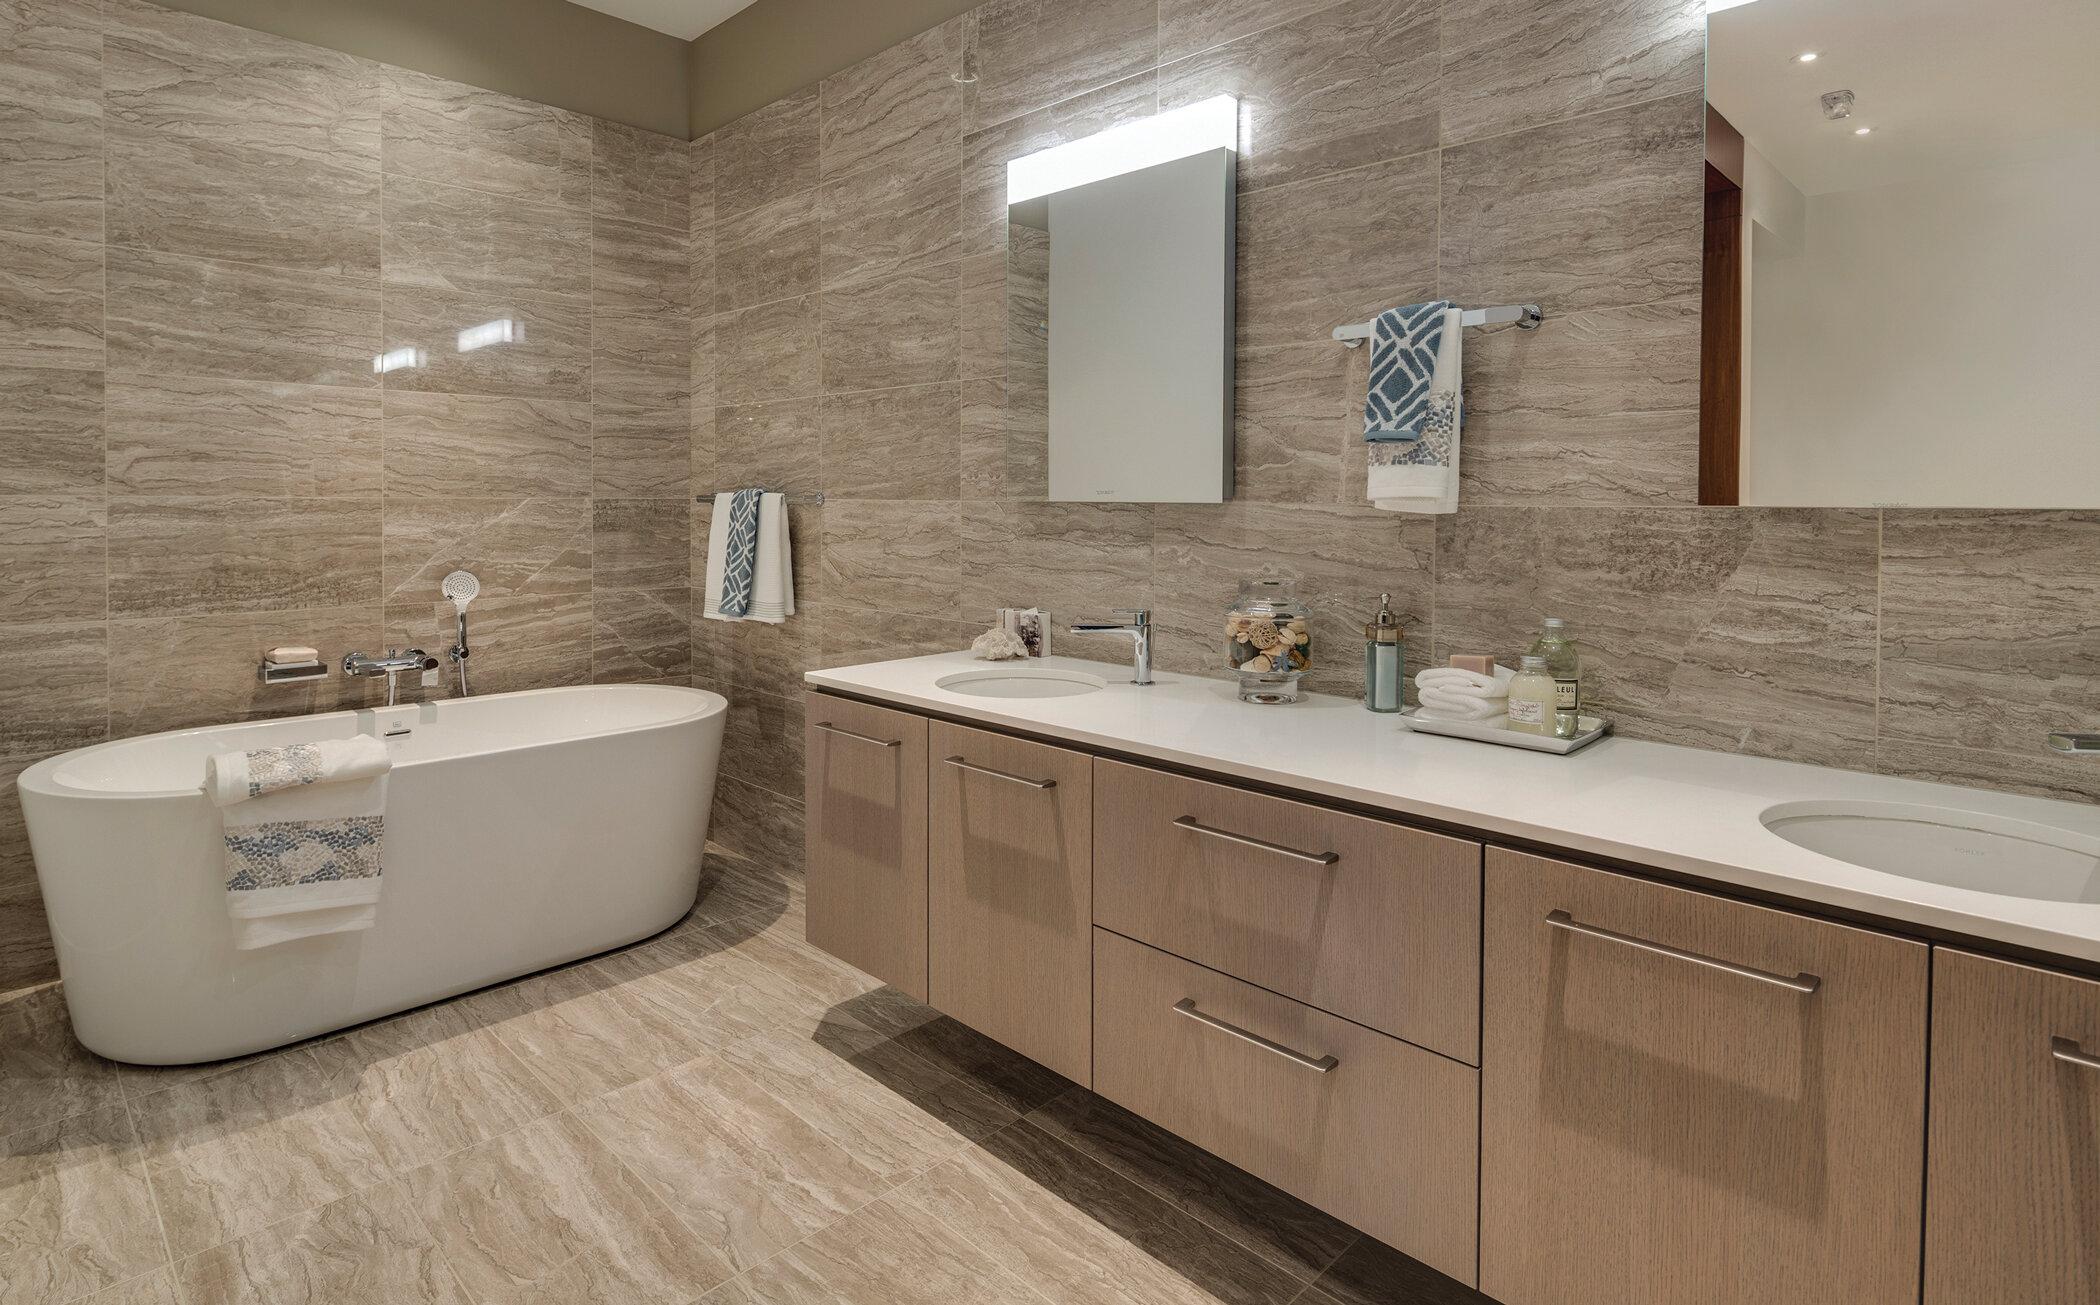 Kitchen Bath Home Design And Remodel, Bathroom Contractors Long Island